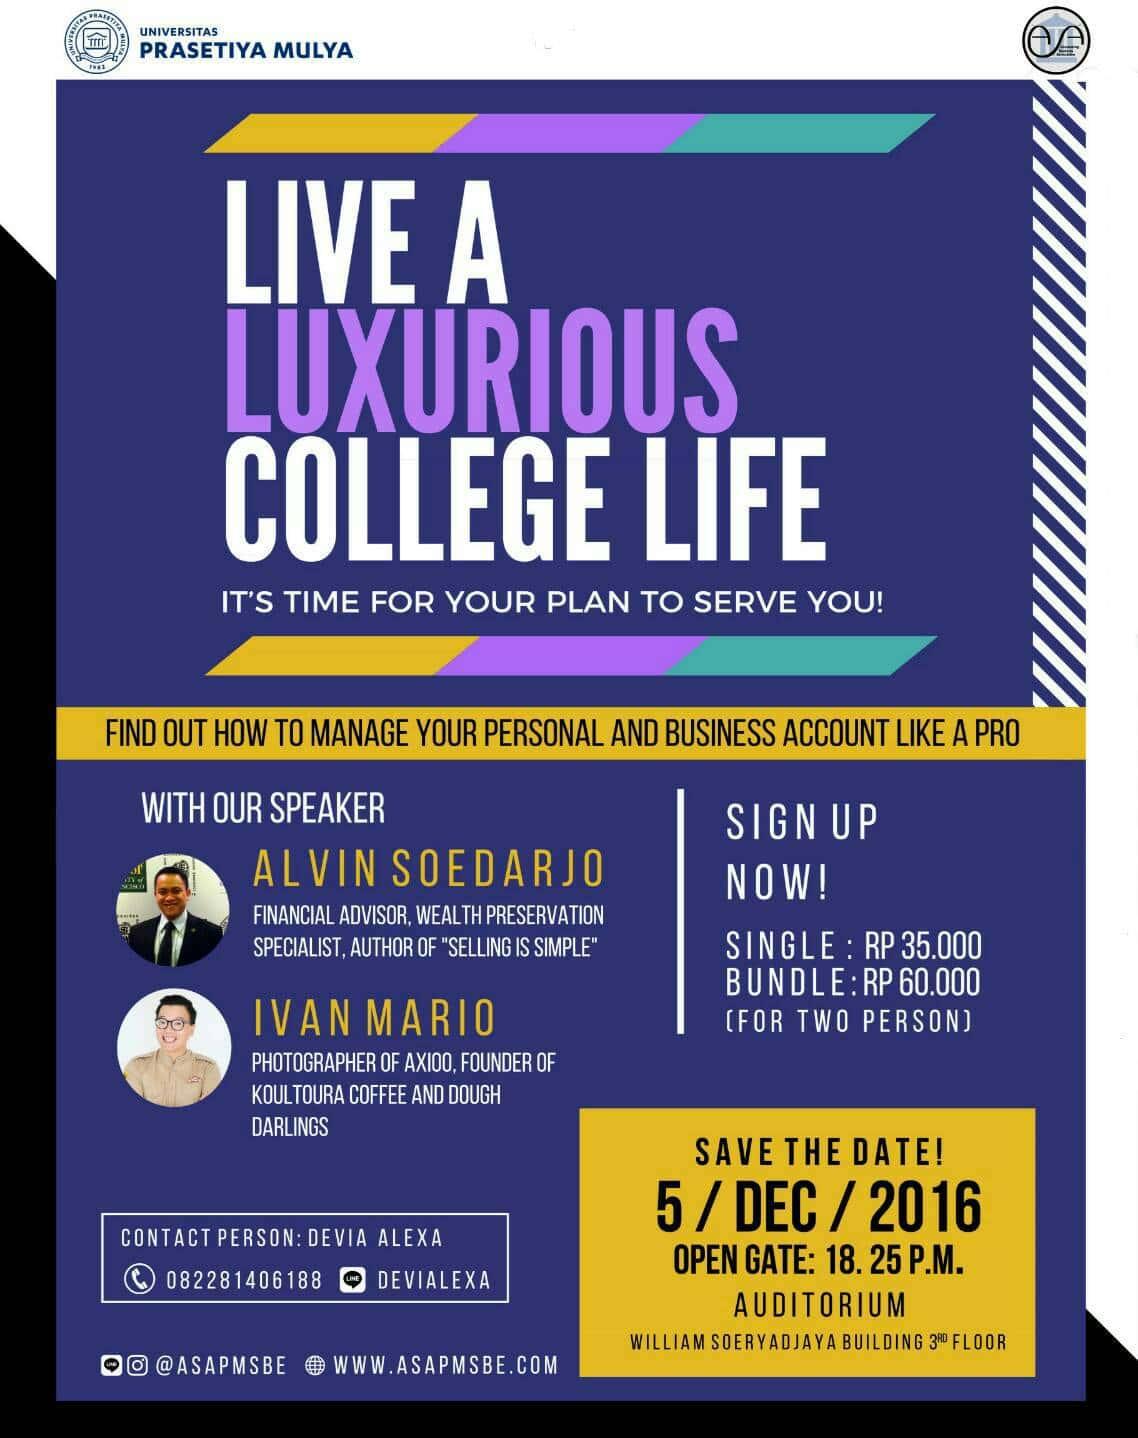 Live a Luxurious Life